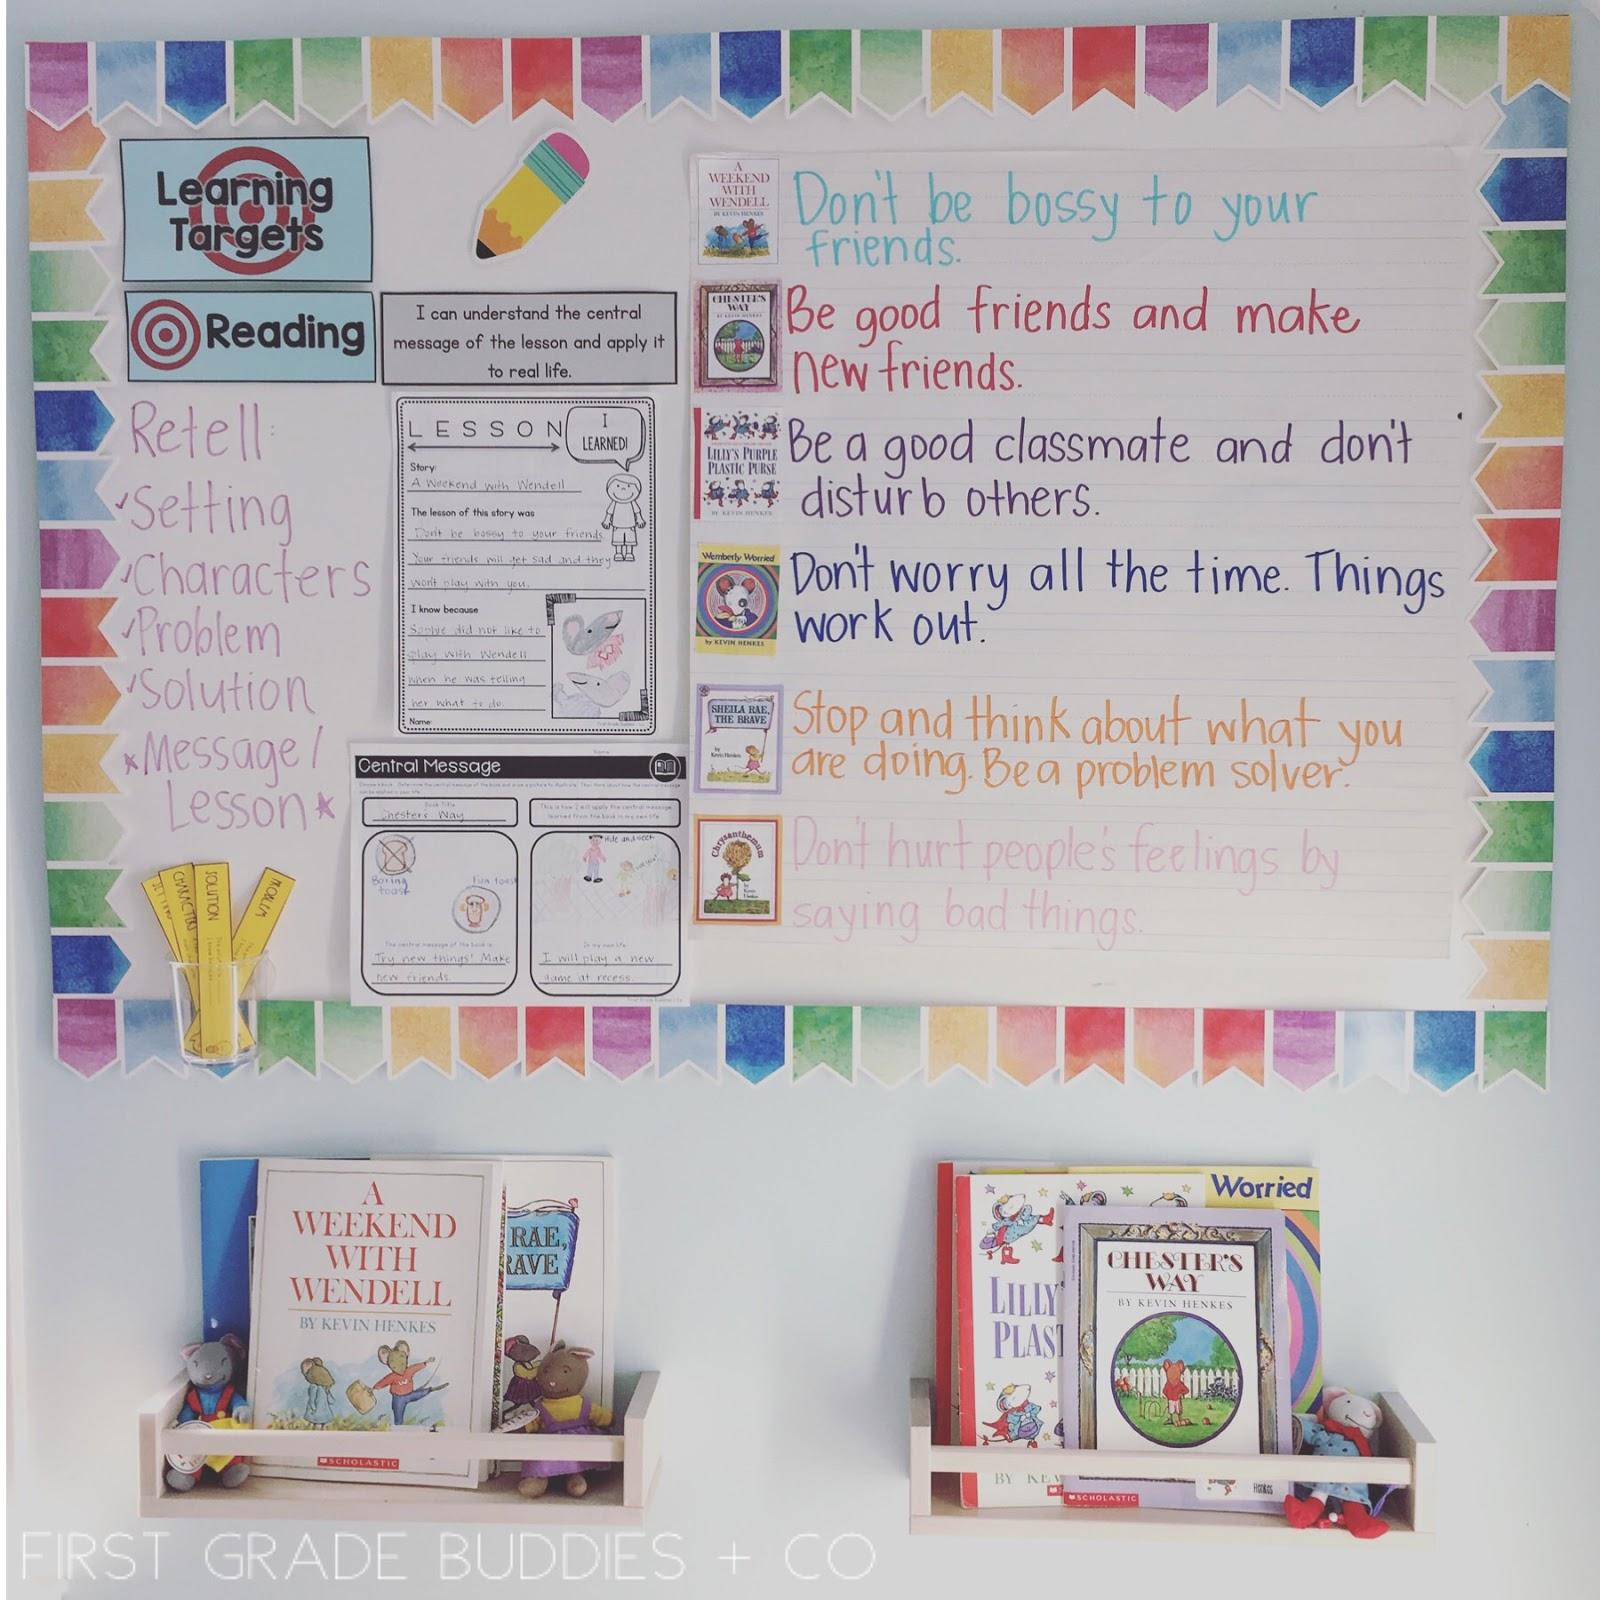 medium resolution of Determining the Central Message (RL 1.2)   First Grade Buddies